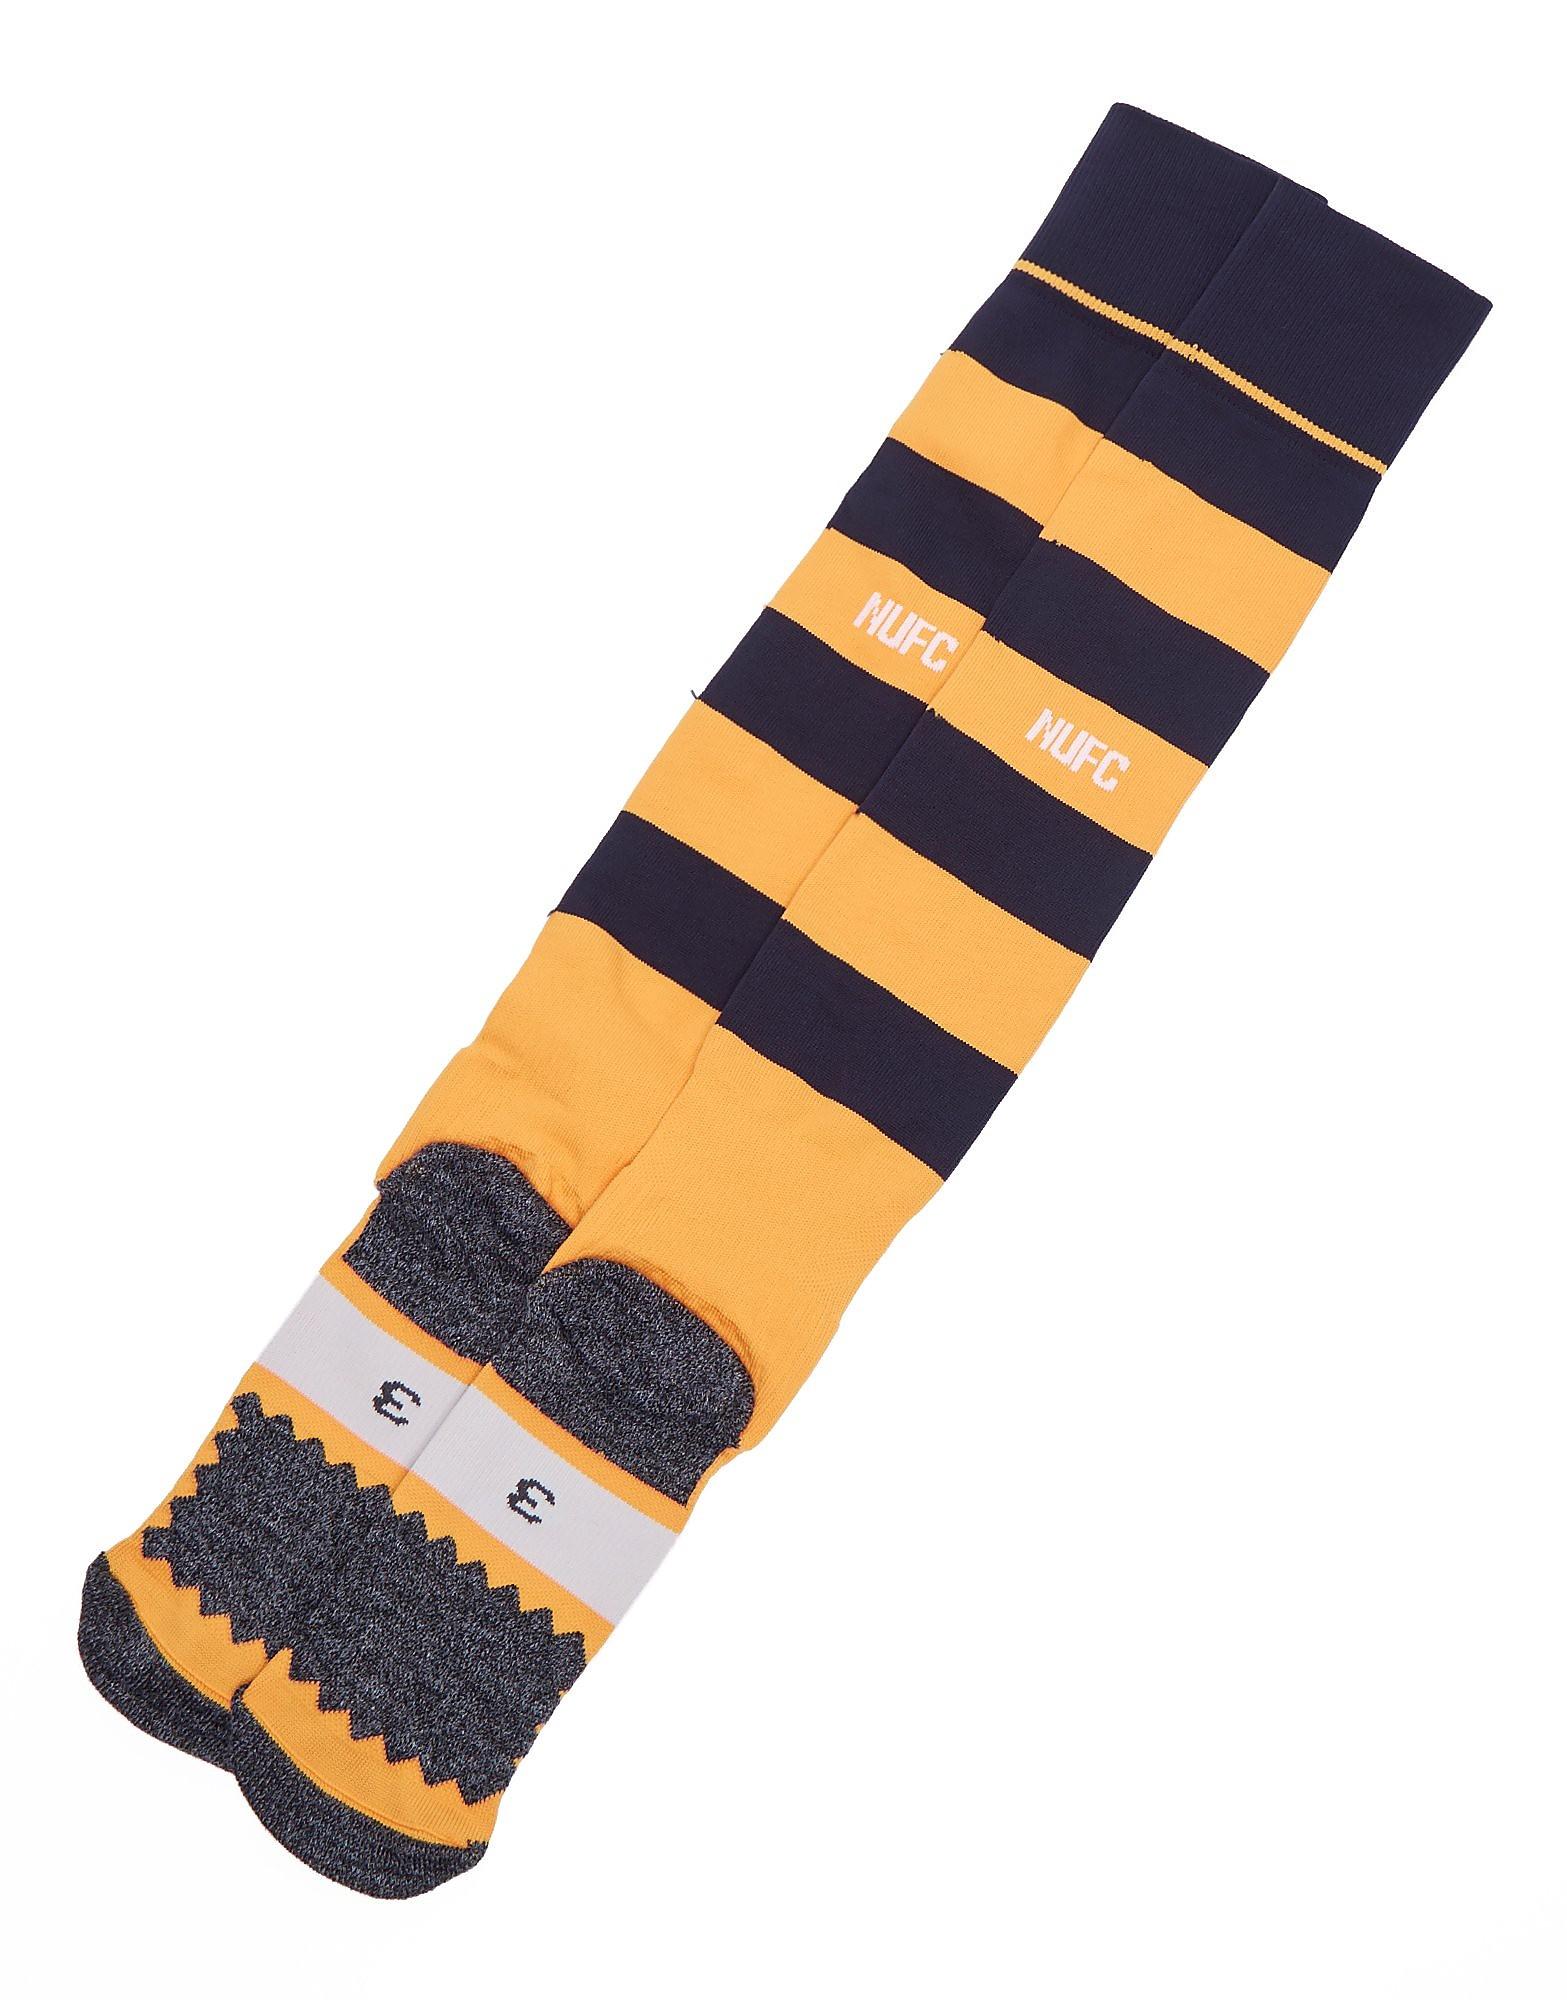 PUMA Newcastle United 2016/17 Third Socks